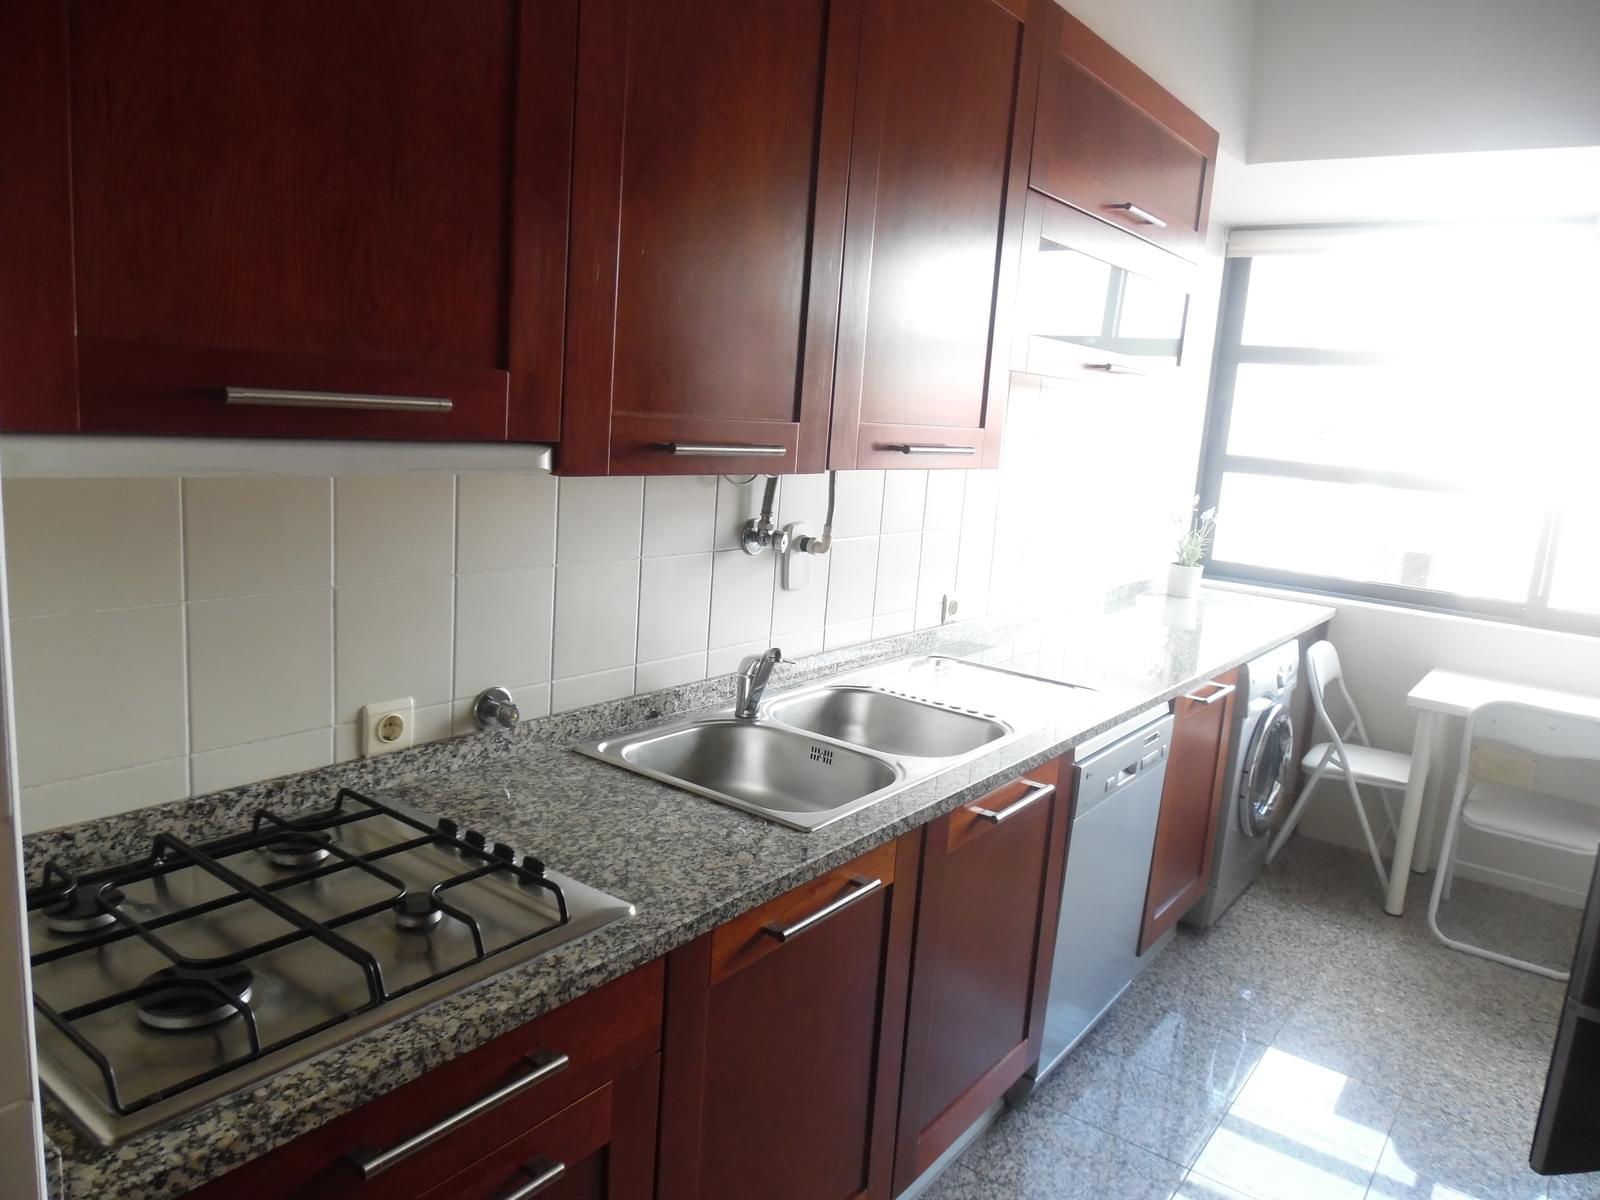 pf18329-apartamento-t1-lisboa-1646b43a-4669-40f3-a00b-8b75f12d9370